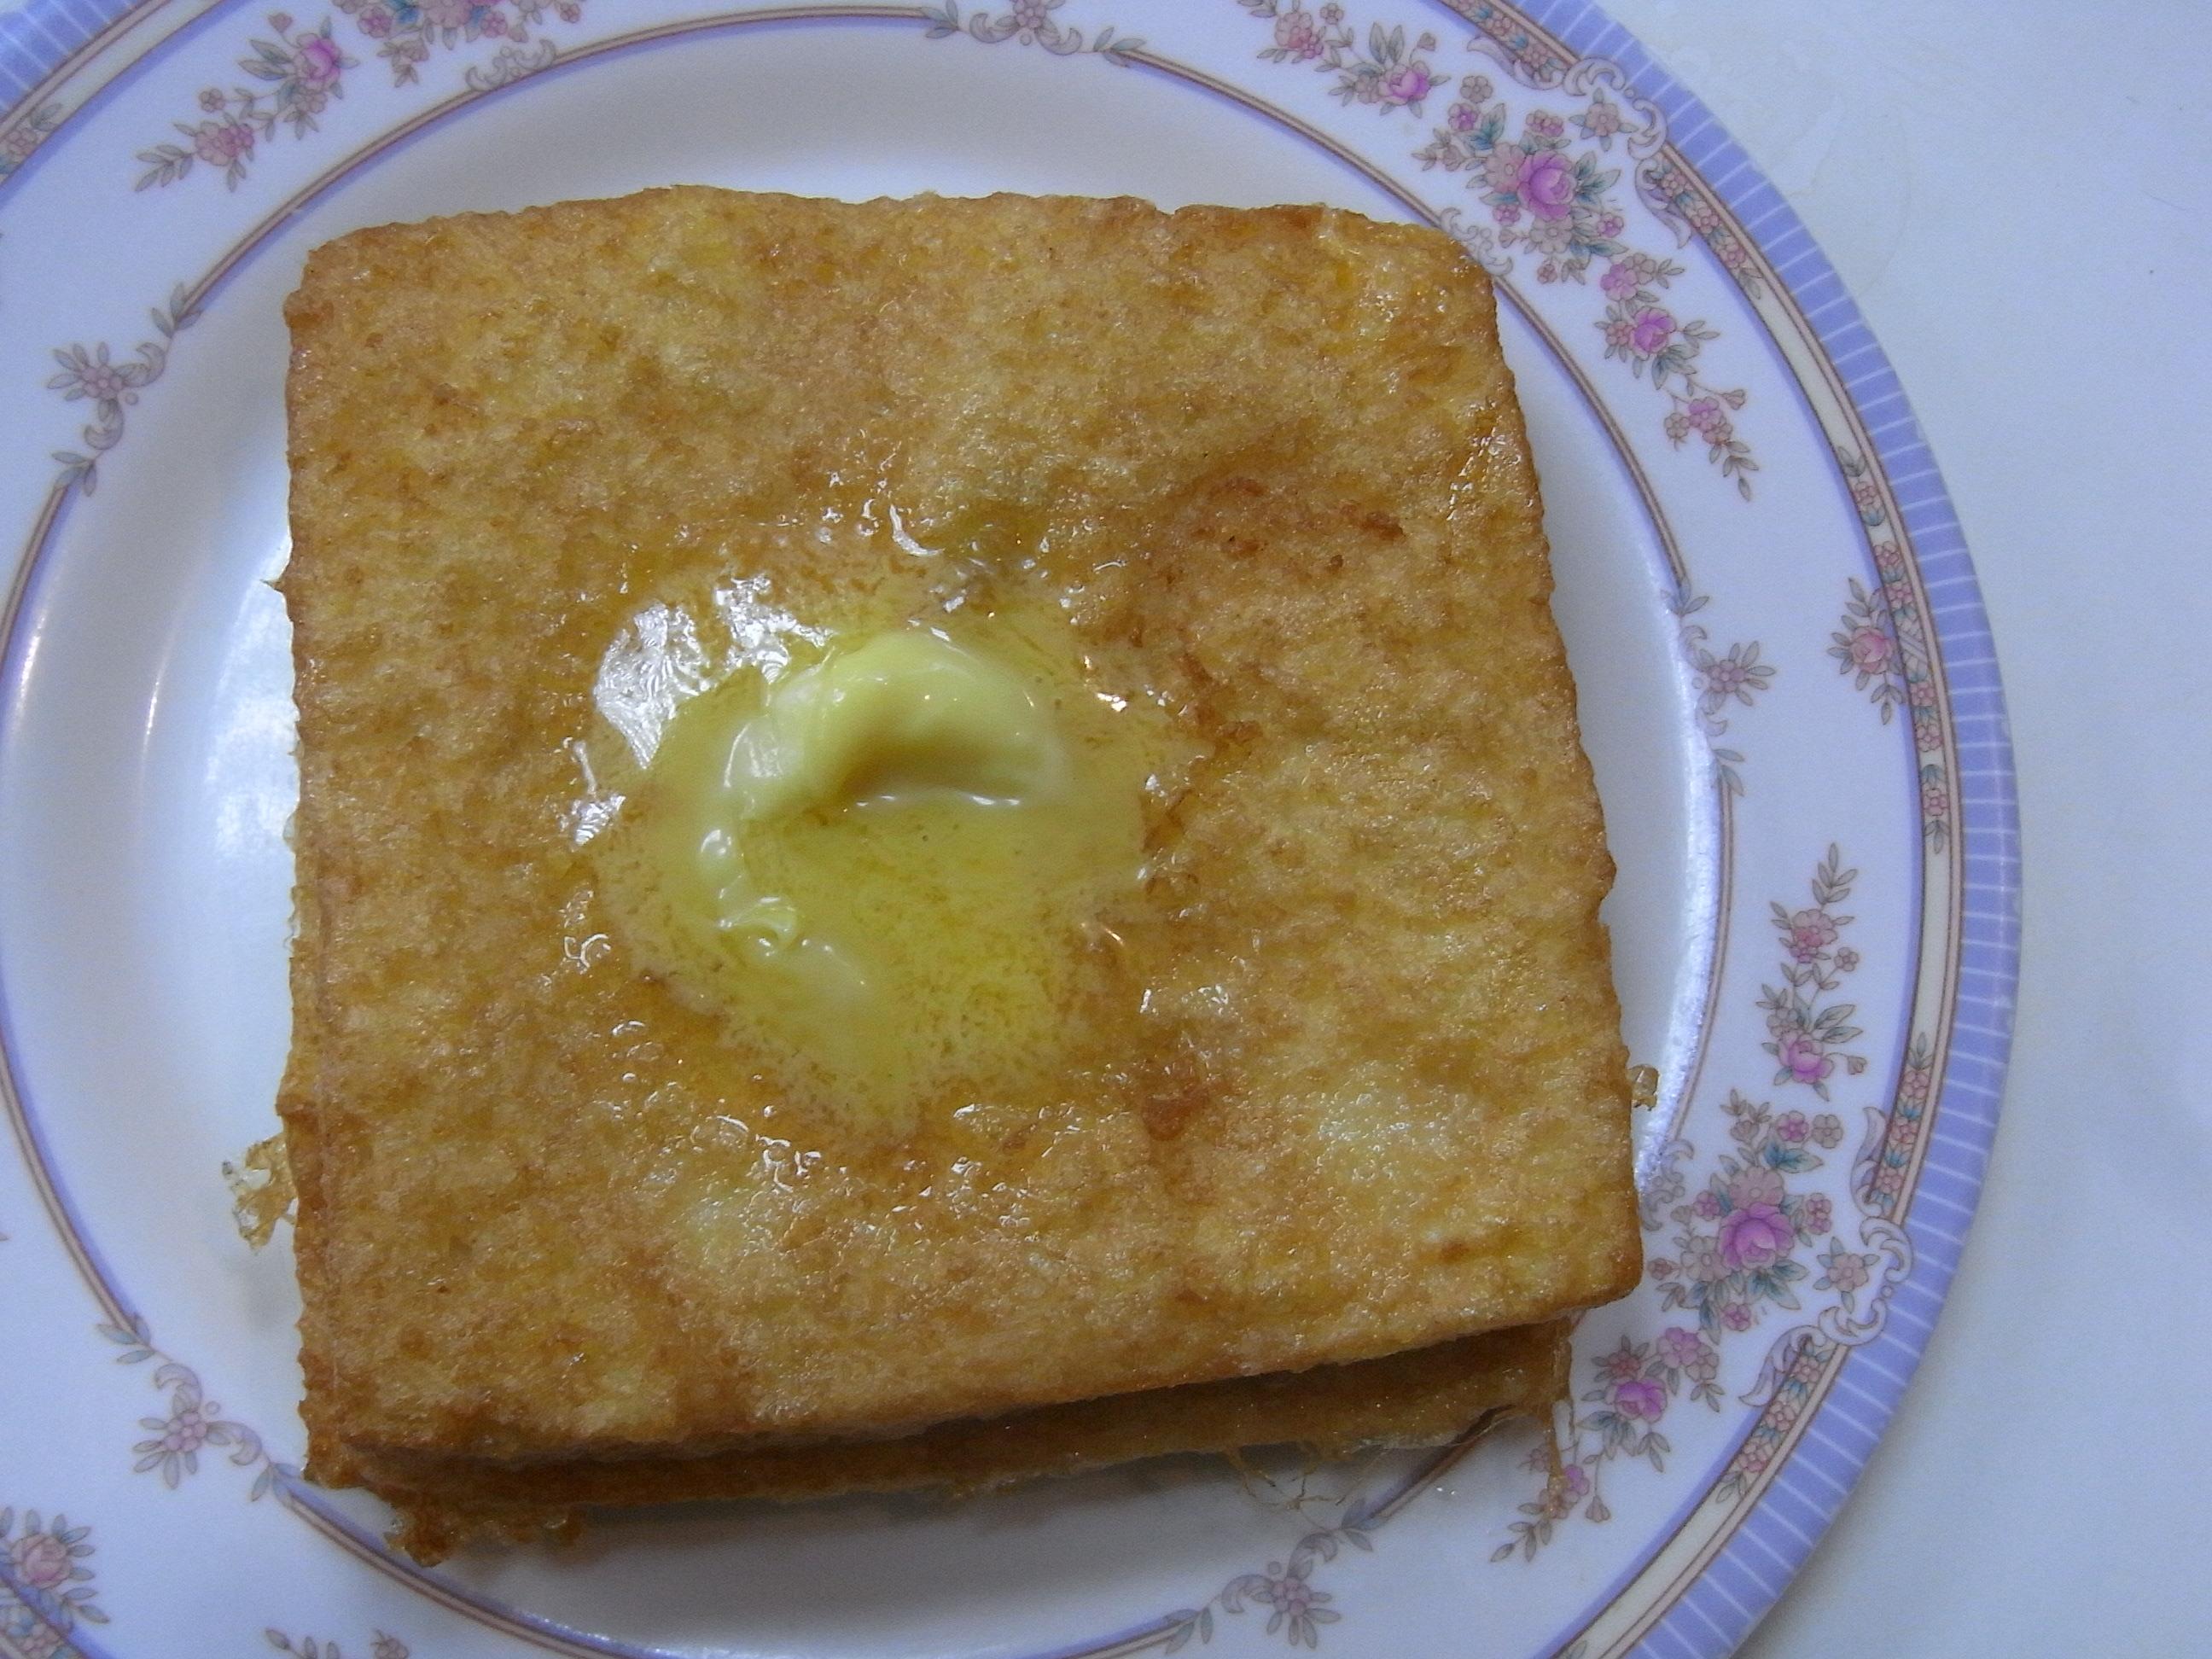 File Hk Sheung Wan Wing Lok Street Deep Fried Butter Bread French Toast Aug 2012 Jpg Wikimedia Commons